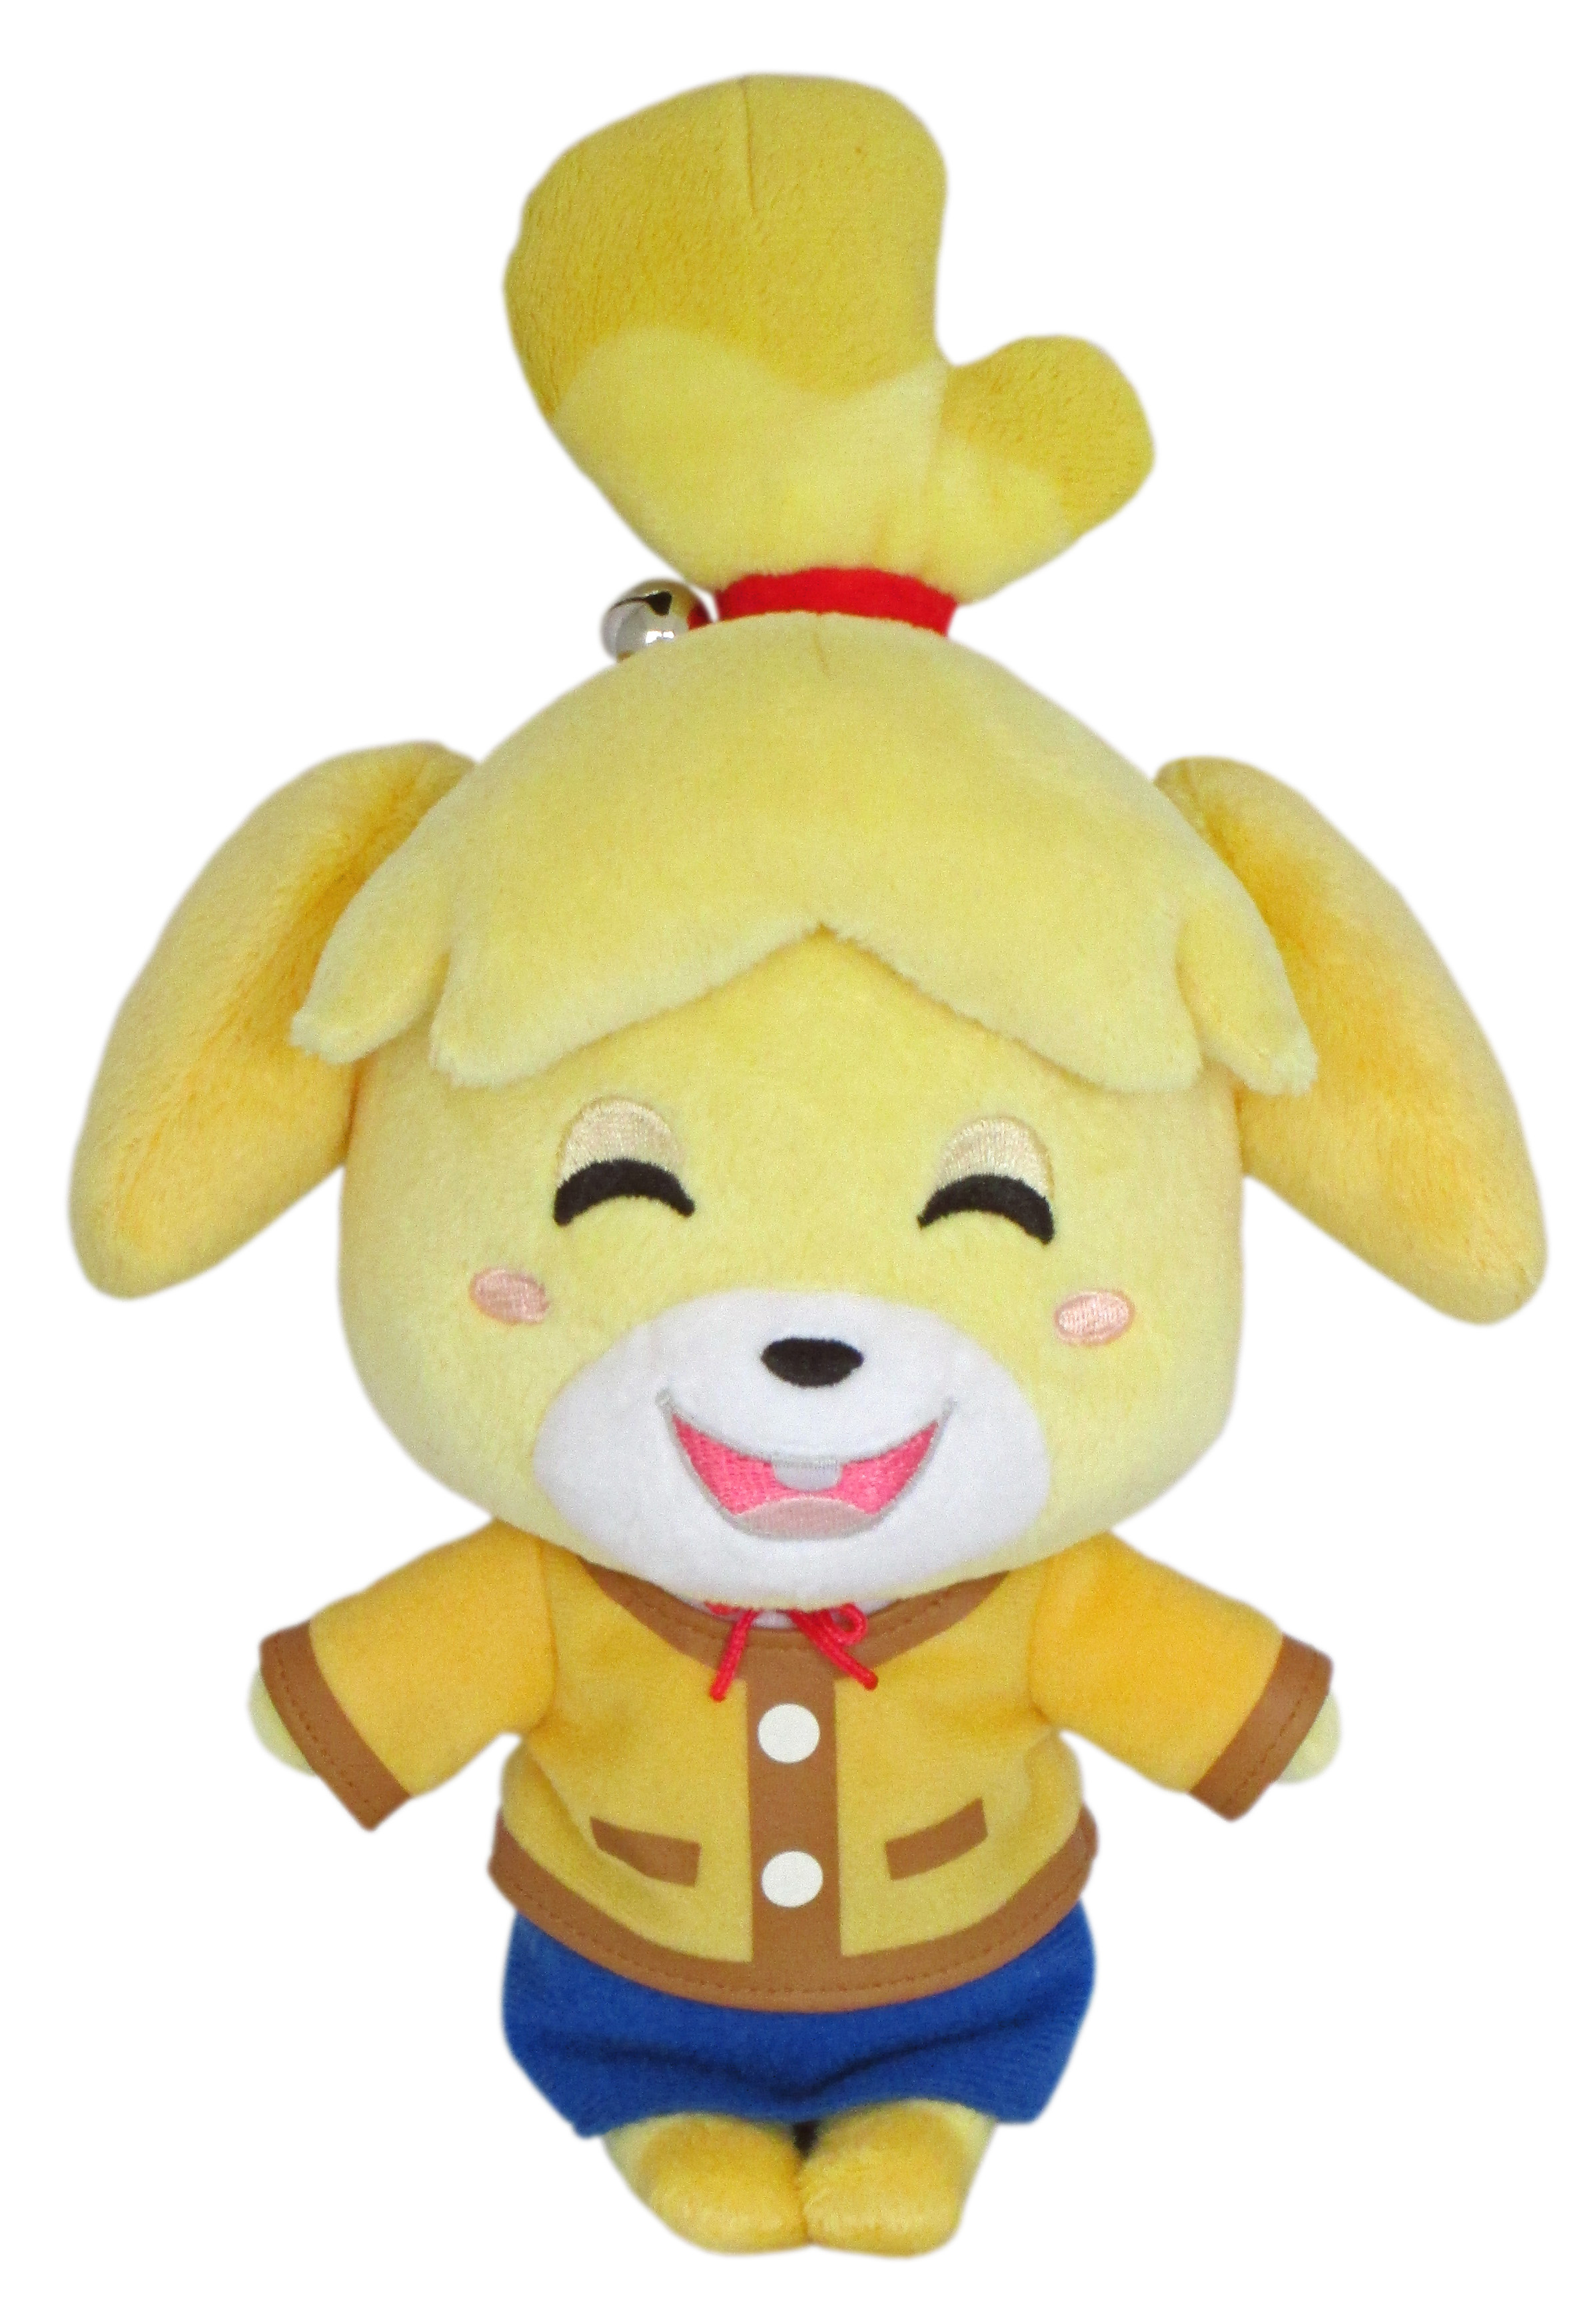 Animal Crossing - Isabelle - Plüschfigur 20 cm